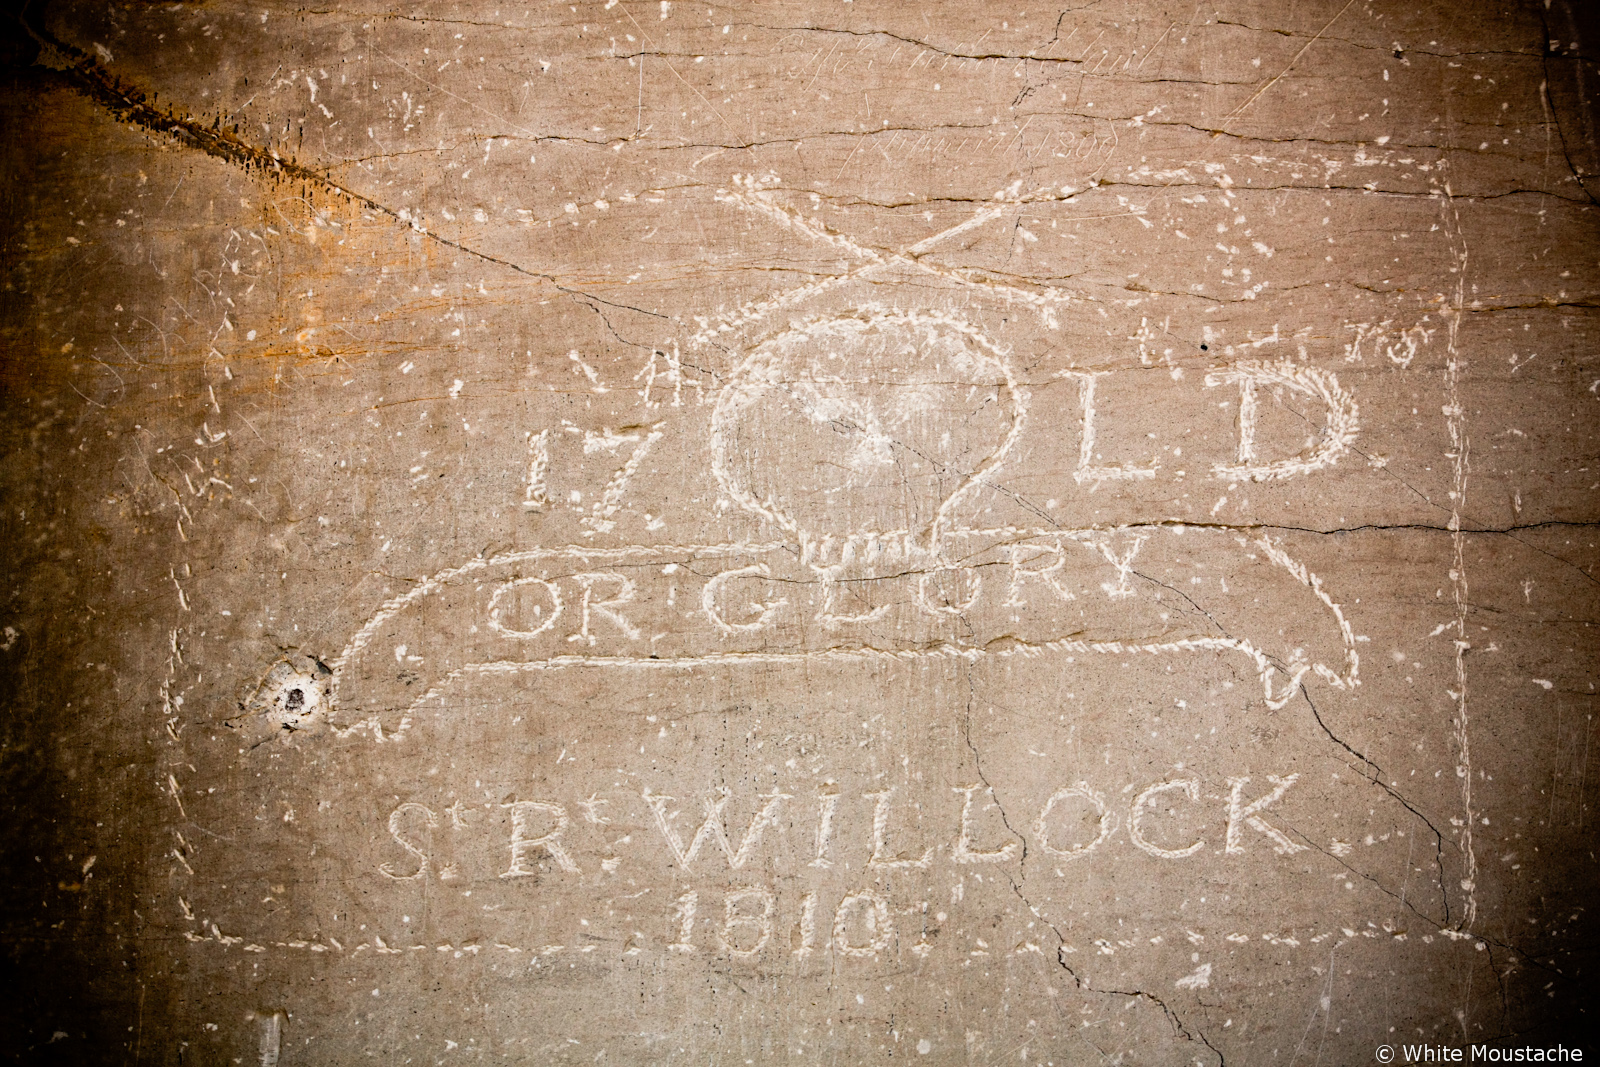 Graffiti z 1810